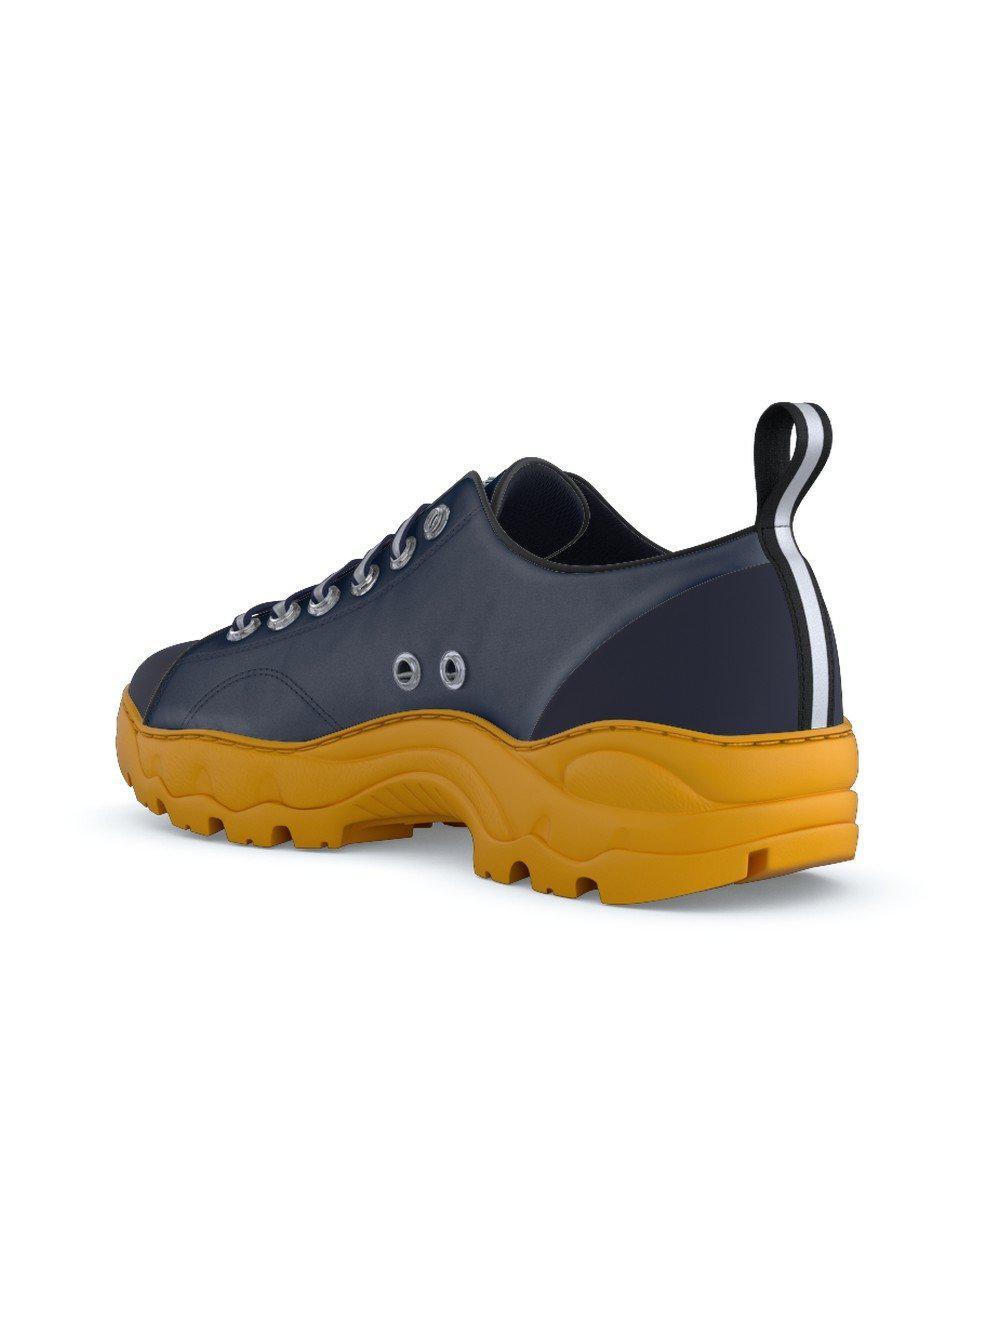 Nori Fast Track Customisation - Blue Swear 2018 For Sale Y5euYM